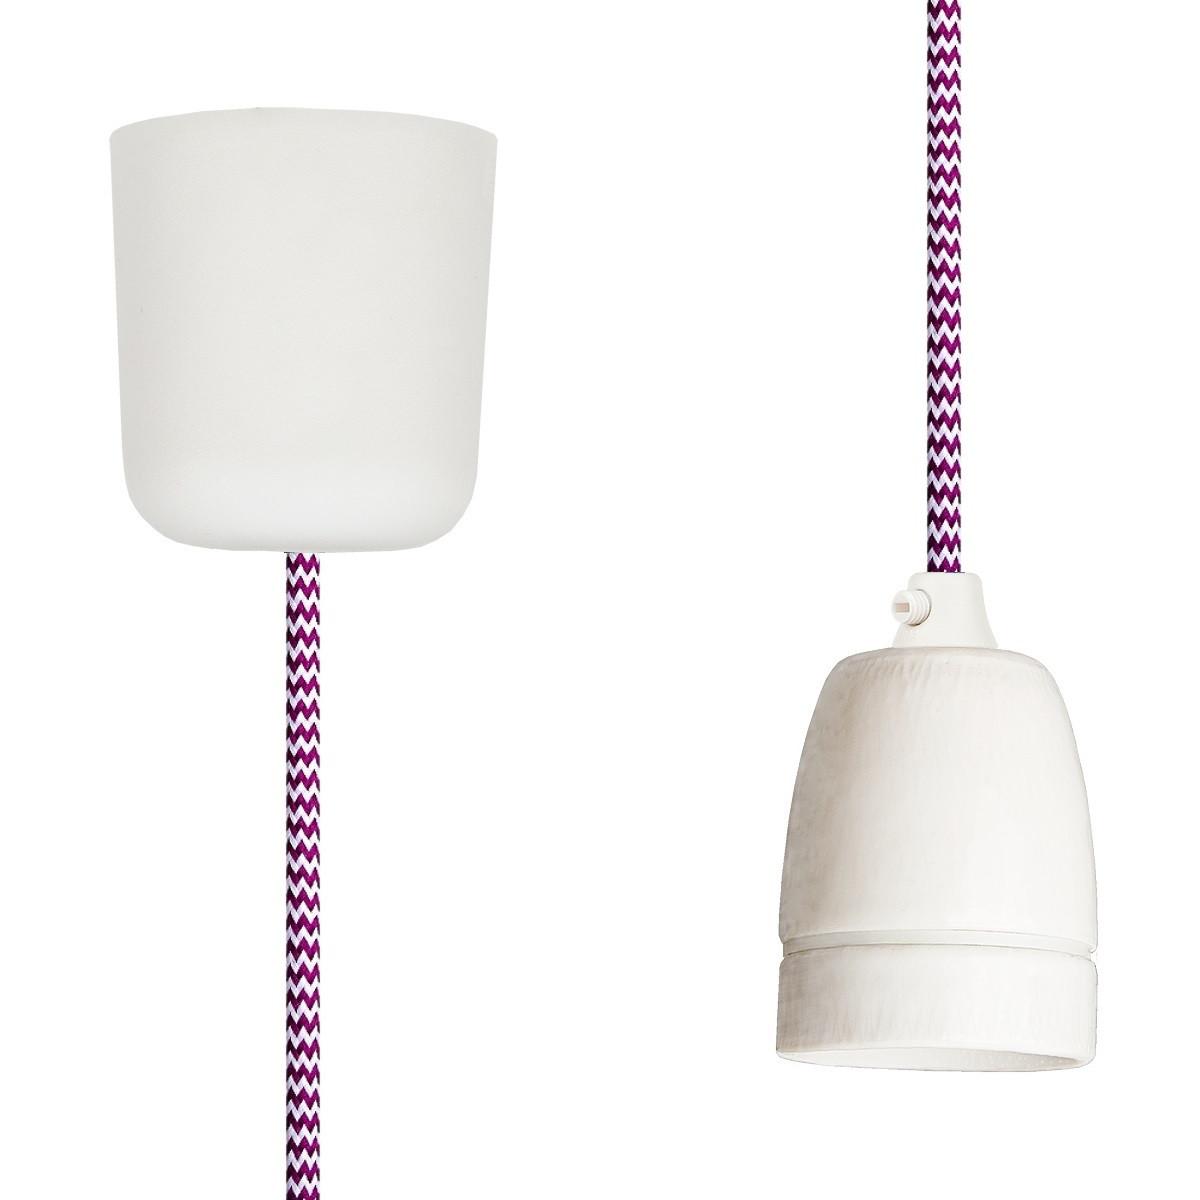 Textilkabel-Hängeleuchte Porzellan weiss-kirschrot zick zack